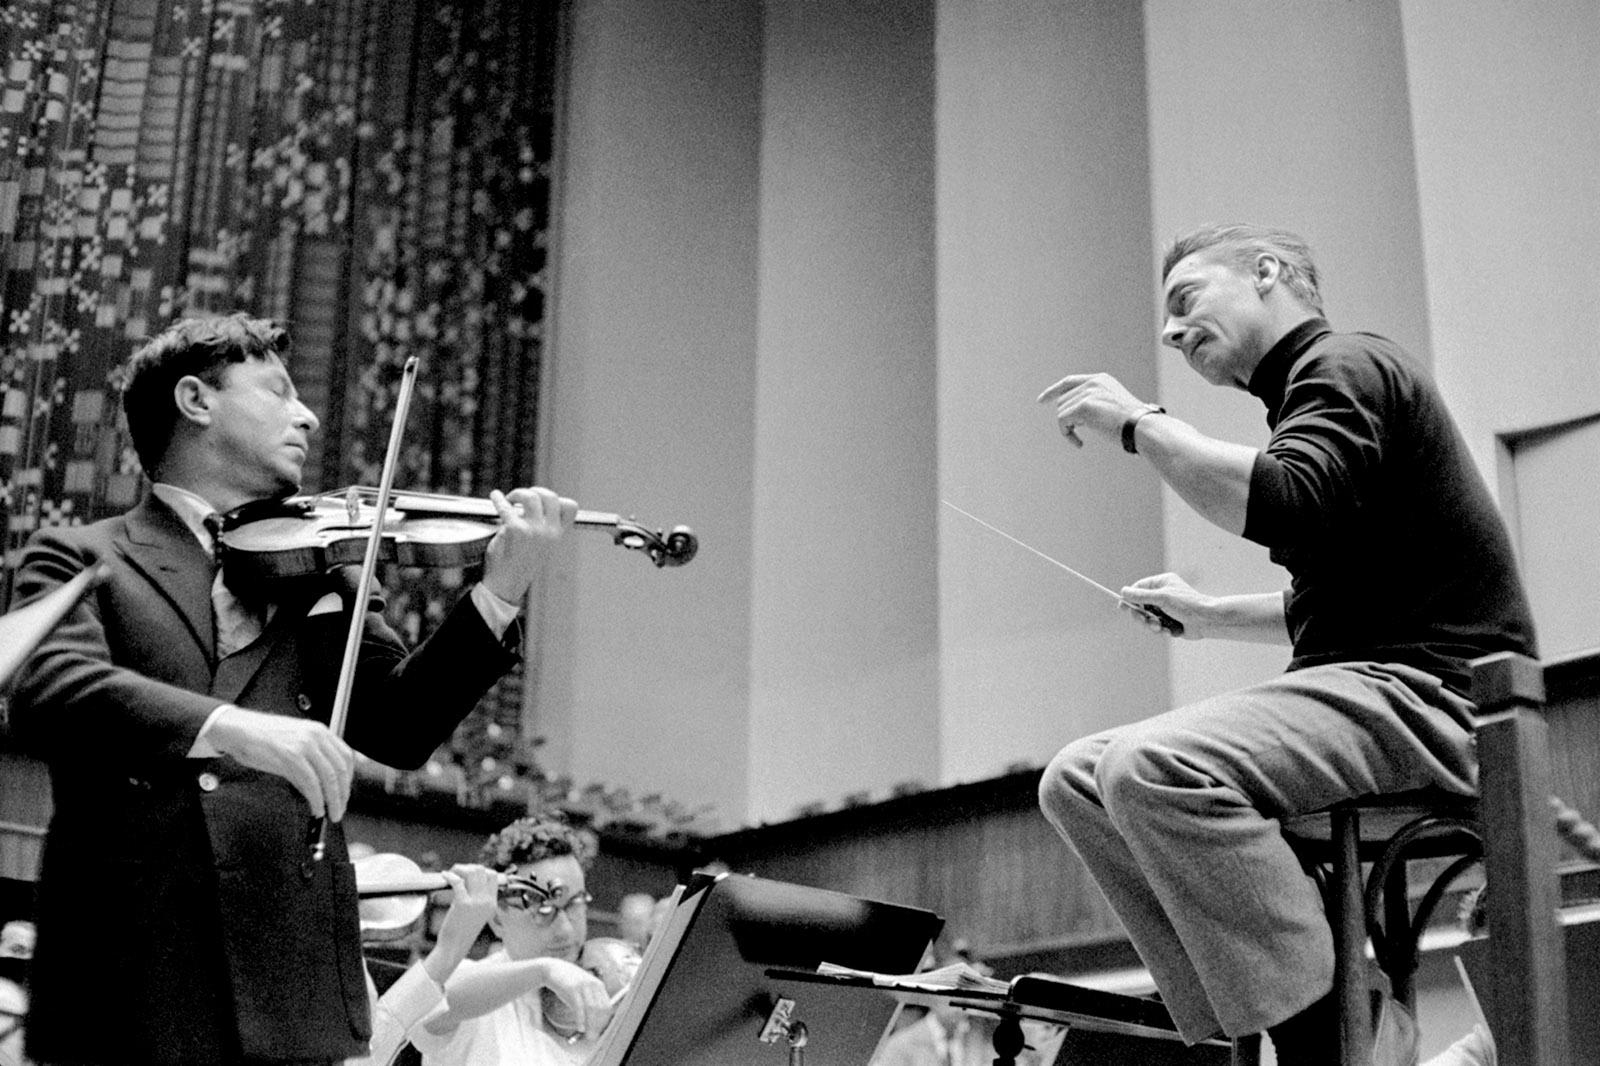 Herbert von Karajan (right) with the violinist Nathan Milstein during a rehearsal, Lucerne, 1957